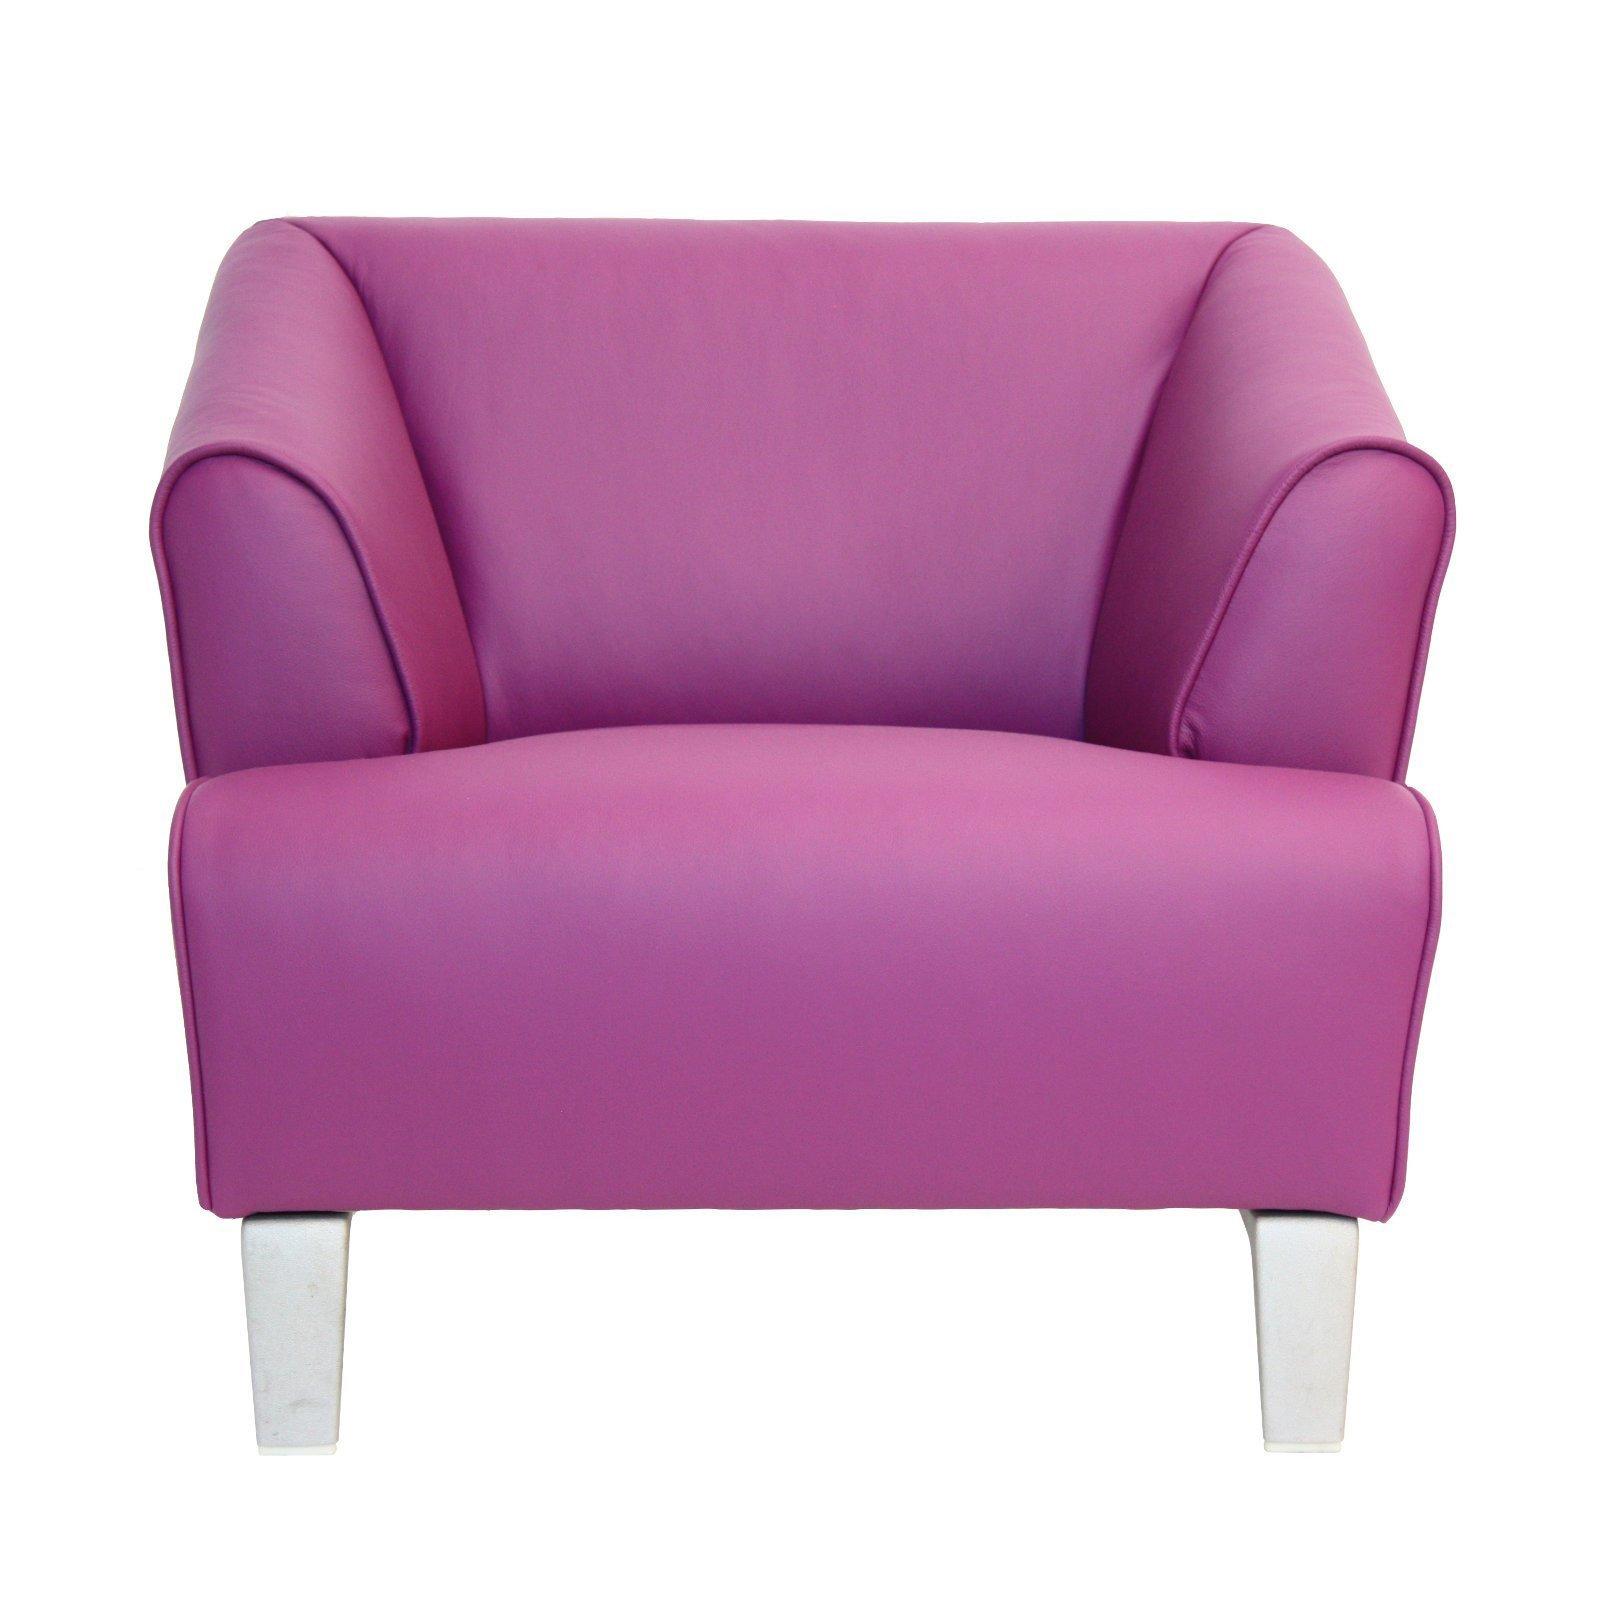 Herstofferen meubel